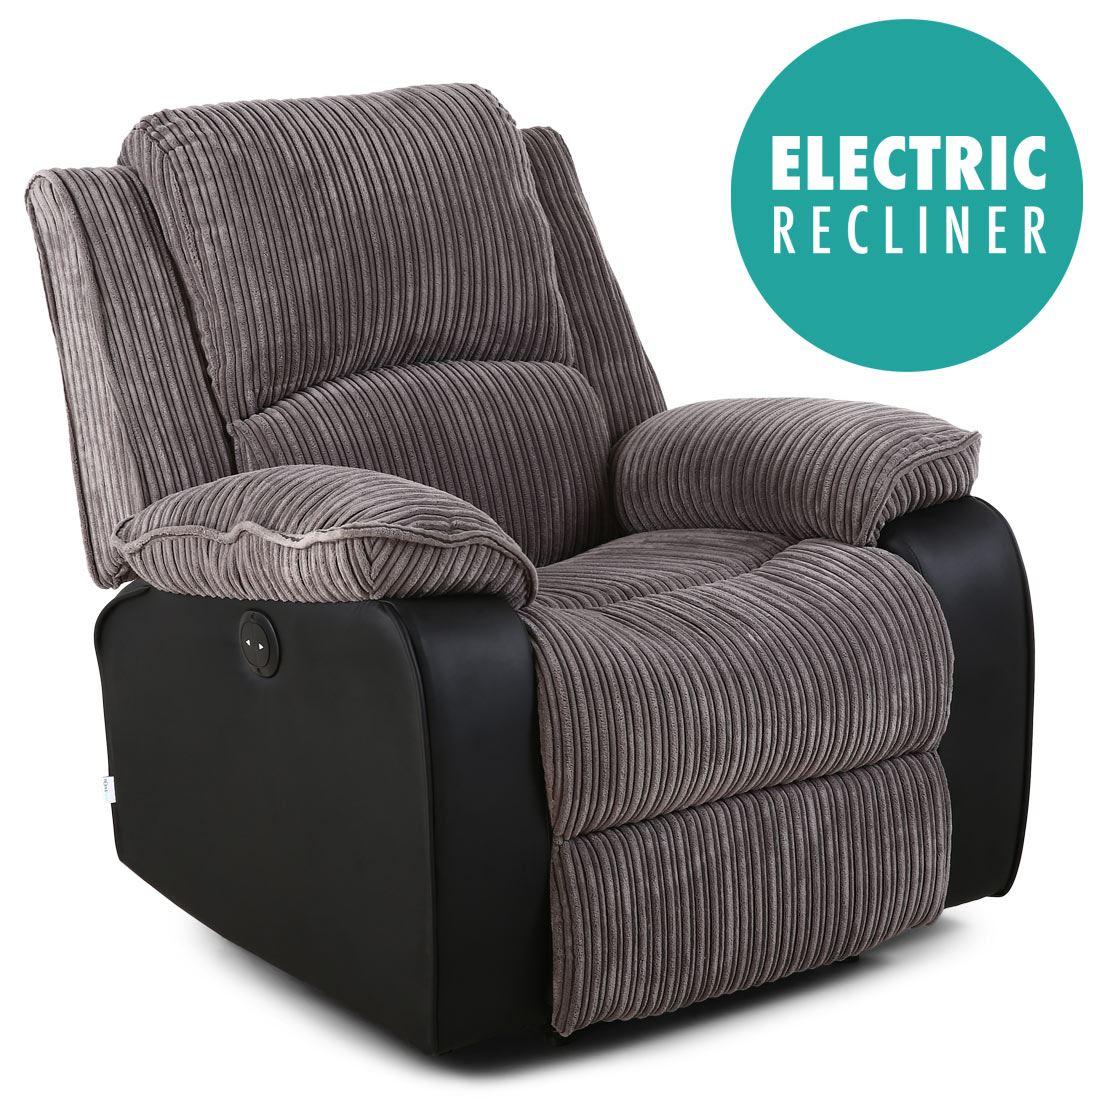 Postana Grey Jumbo Cord Fabric Power Recliner Armchair